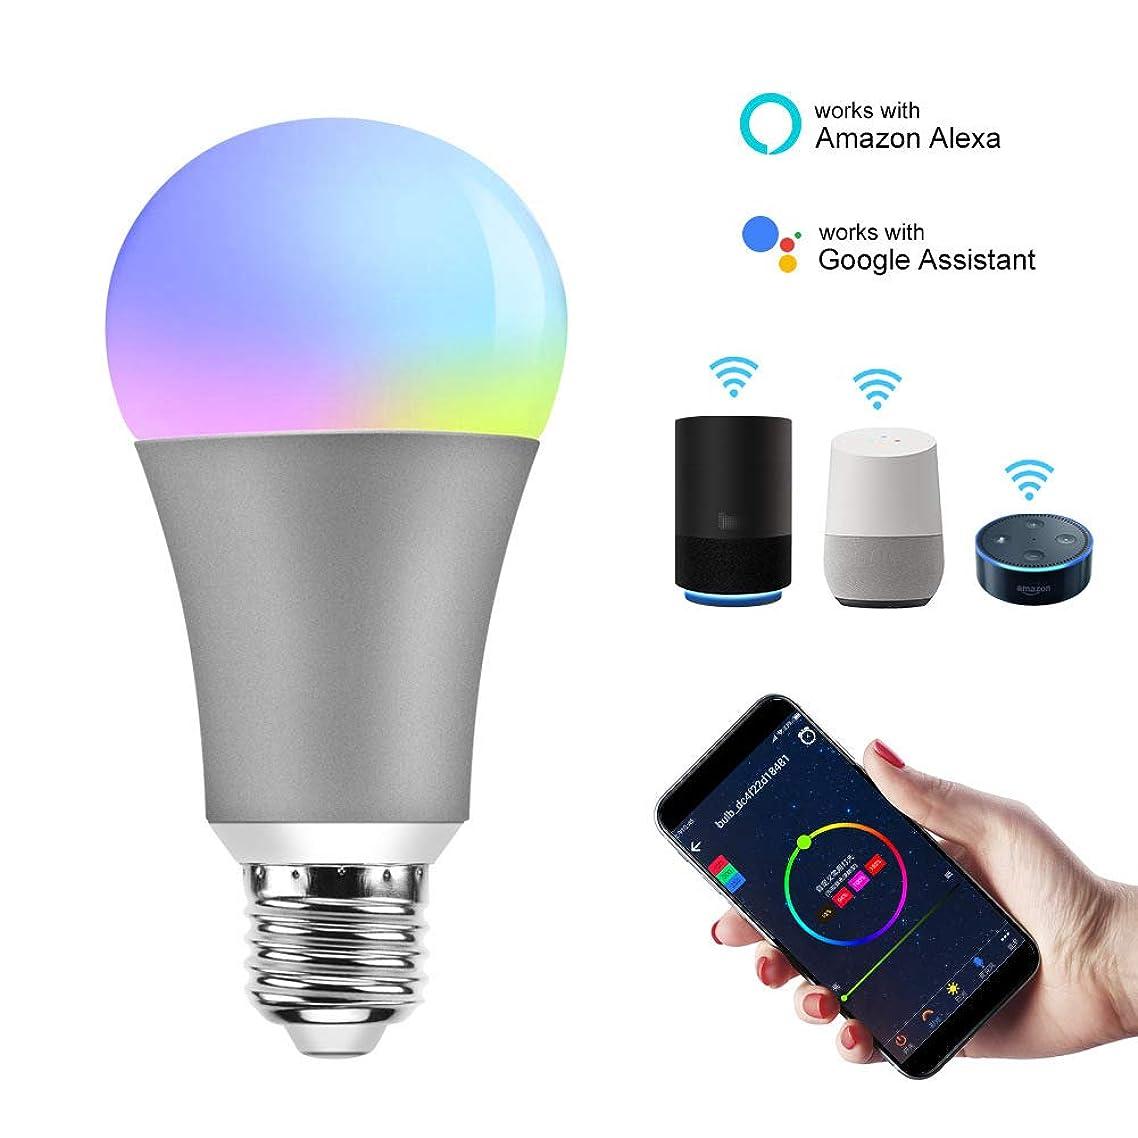 WiFi Smart Bulb,LED Smart Light Bulb E27 Base LED Multicolor Light,Compatible with Amazon Alexa Google Home, Dimmable RGB Smart Light Bulb